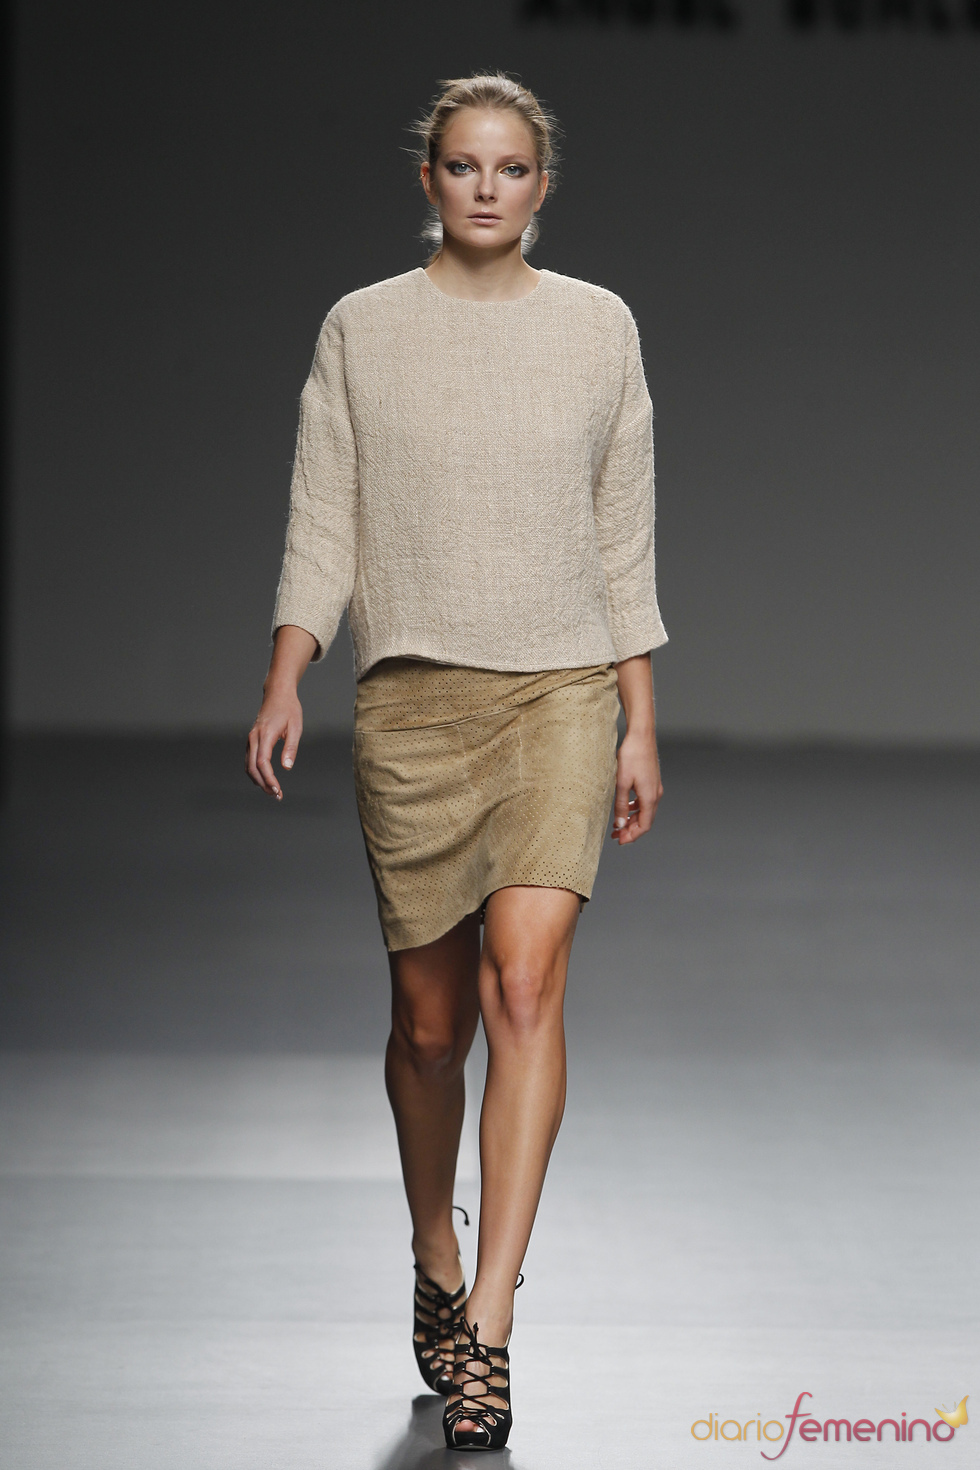 Cibeles Madrid Fashion Week 09-2010:  Ángel Schlesser